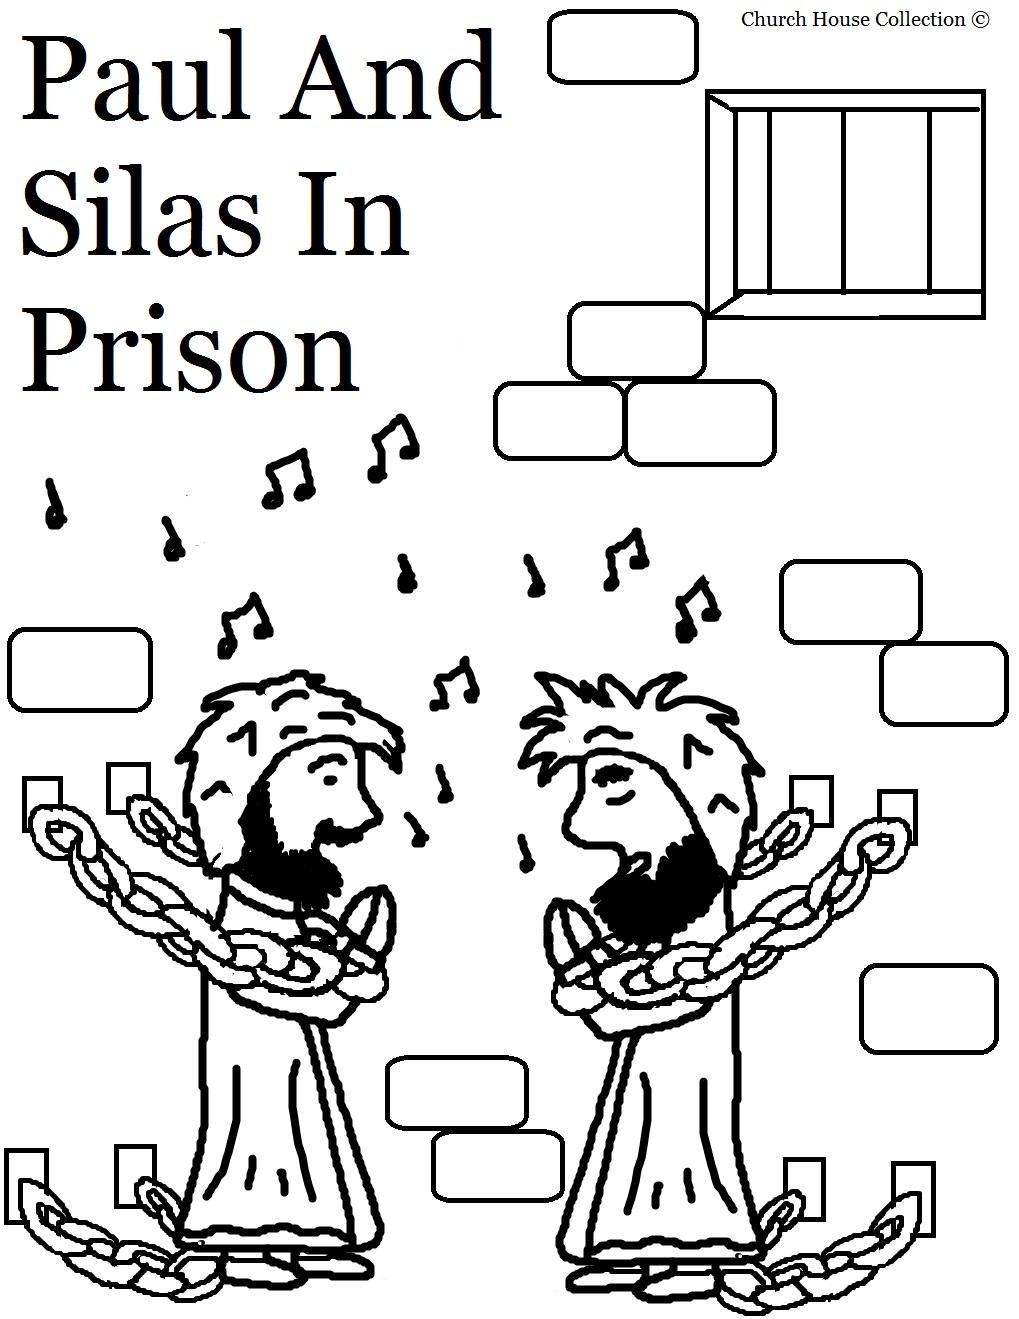 Similiar Paul And Silas Bible Keywords